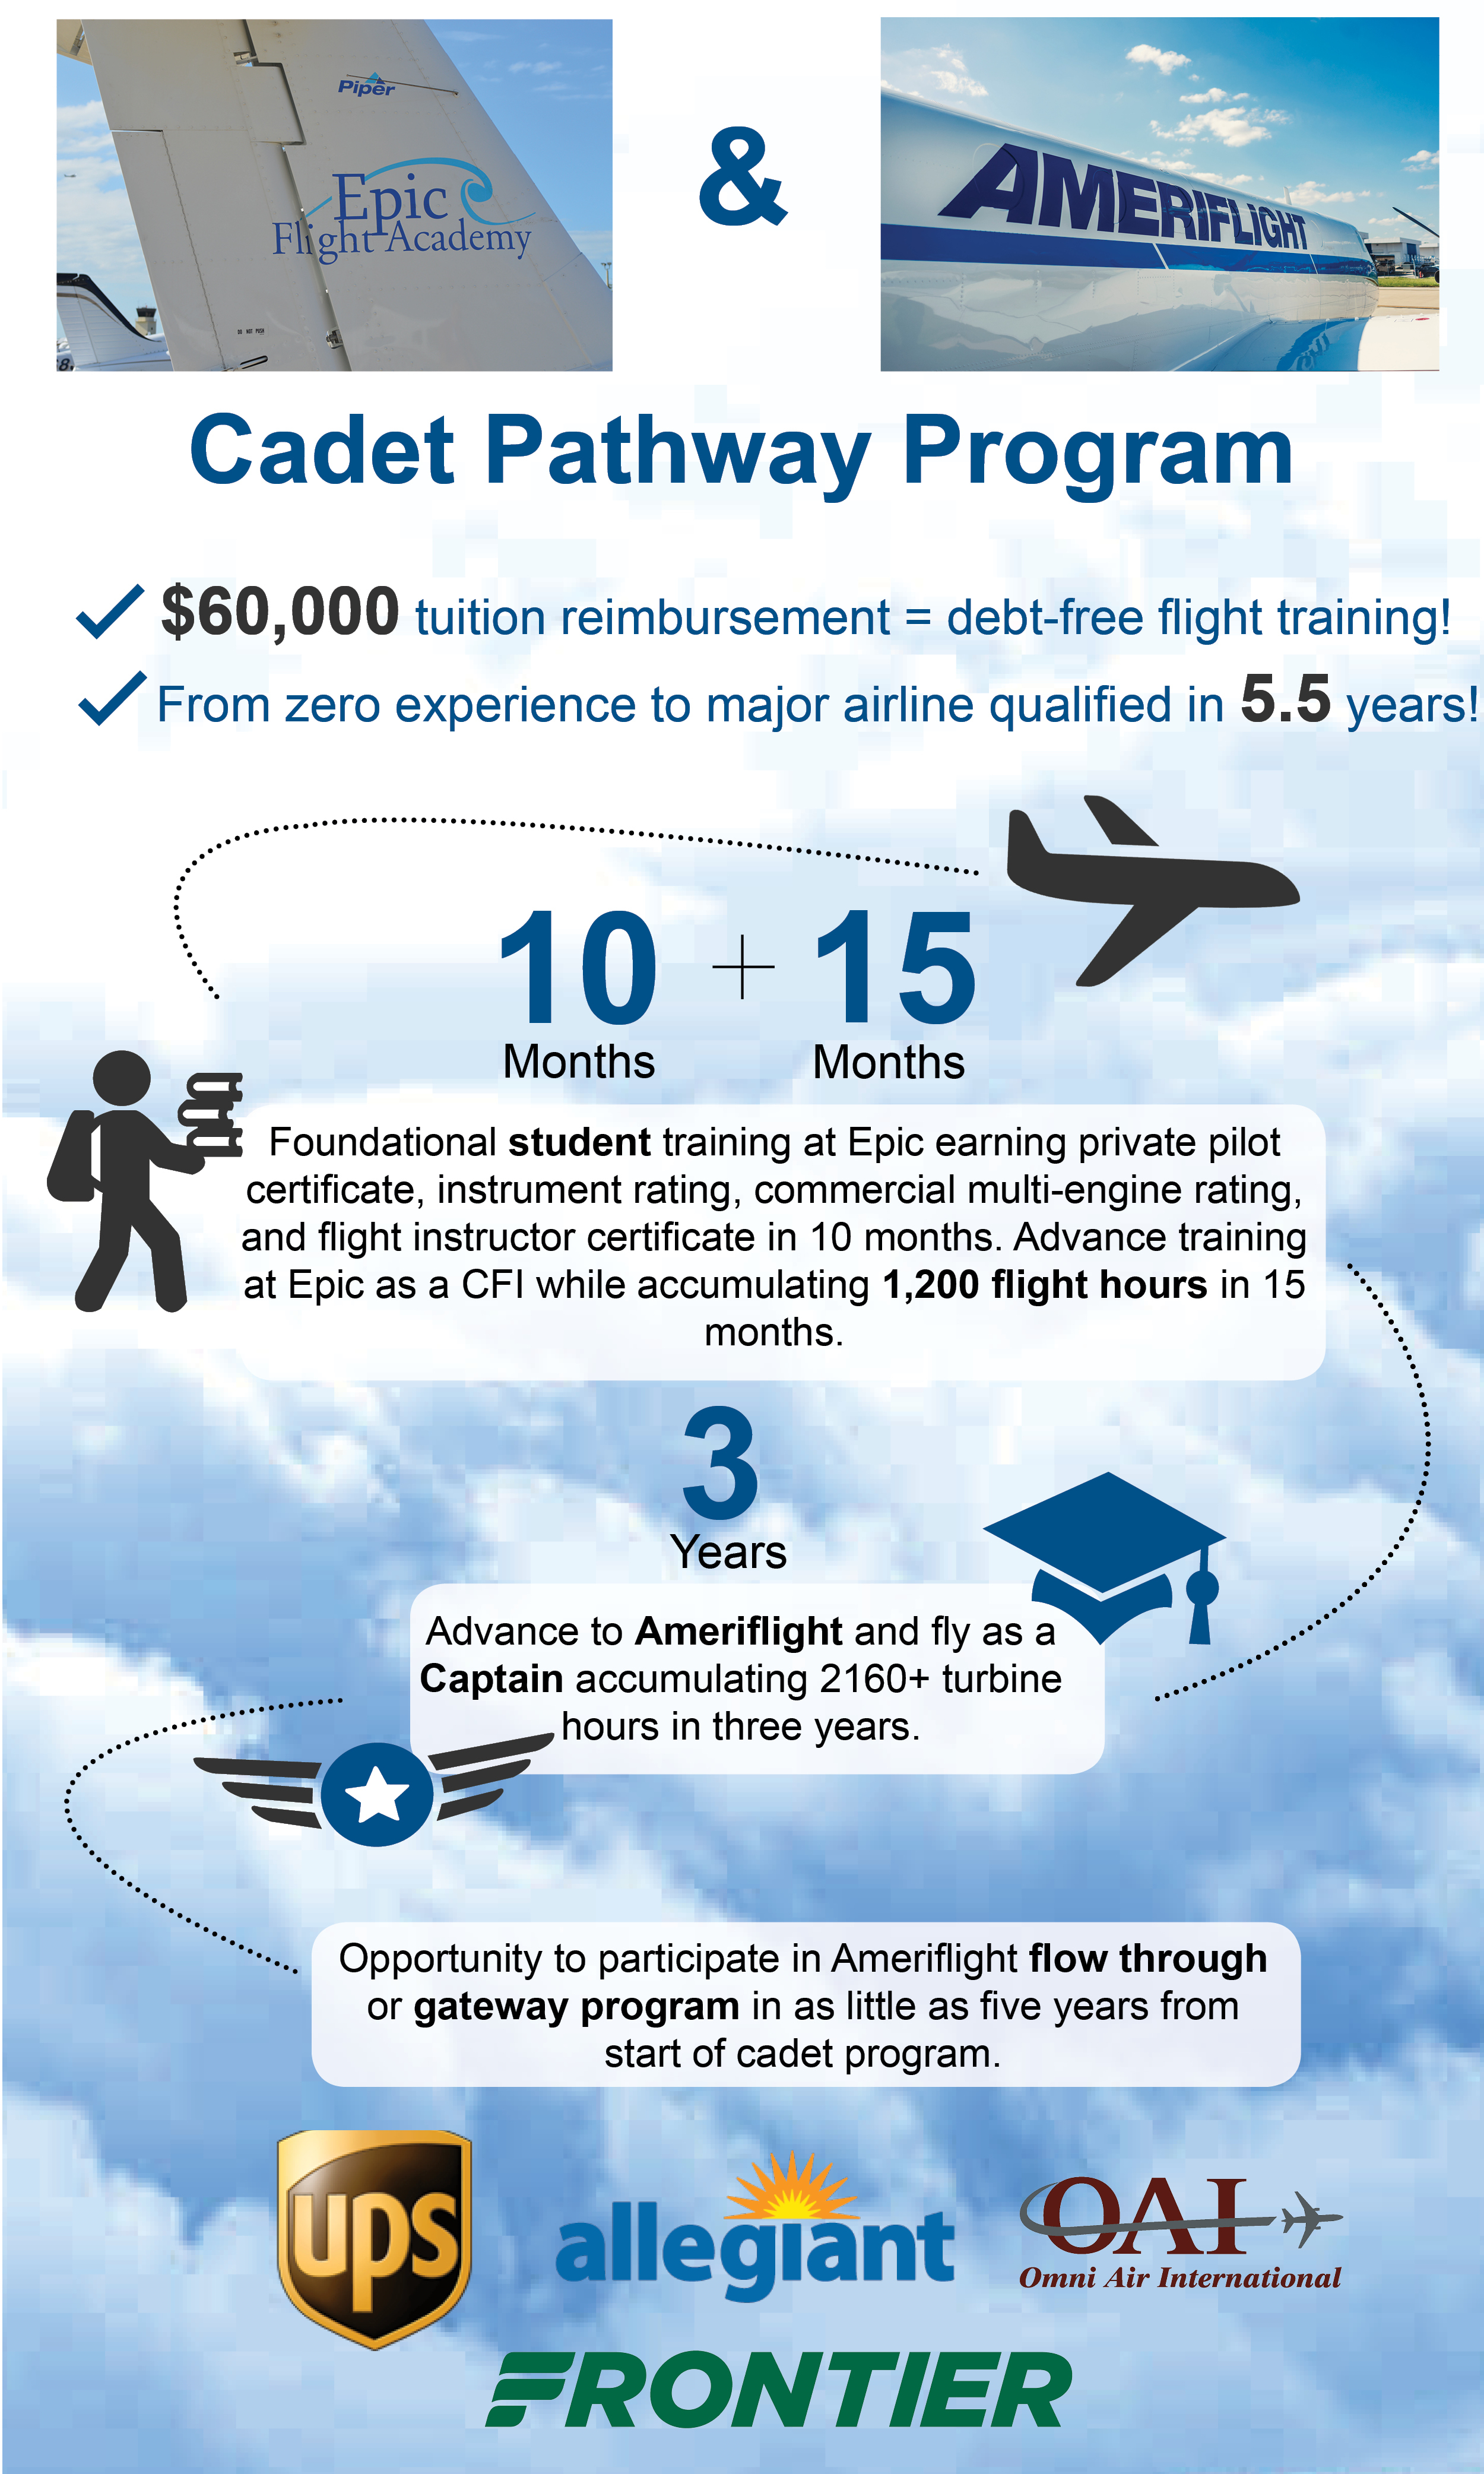 Ameriflight and Epic Flight Academy Sign Cadet Pathway